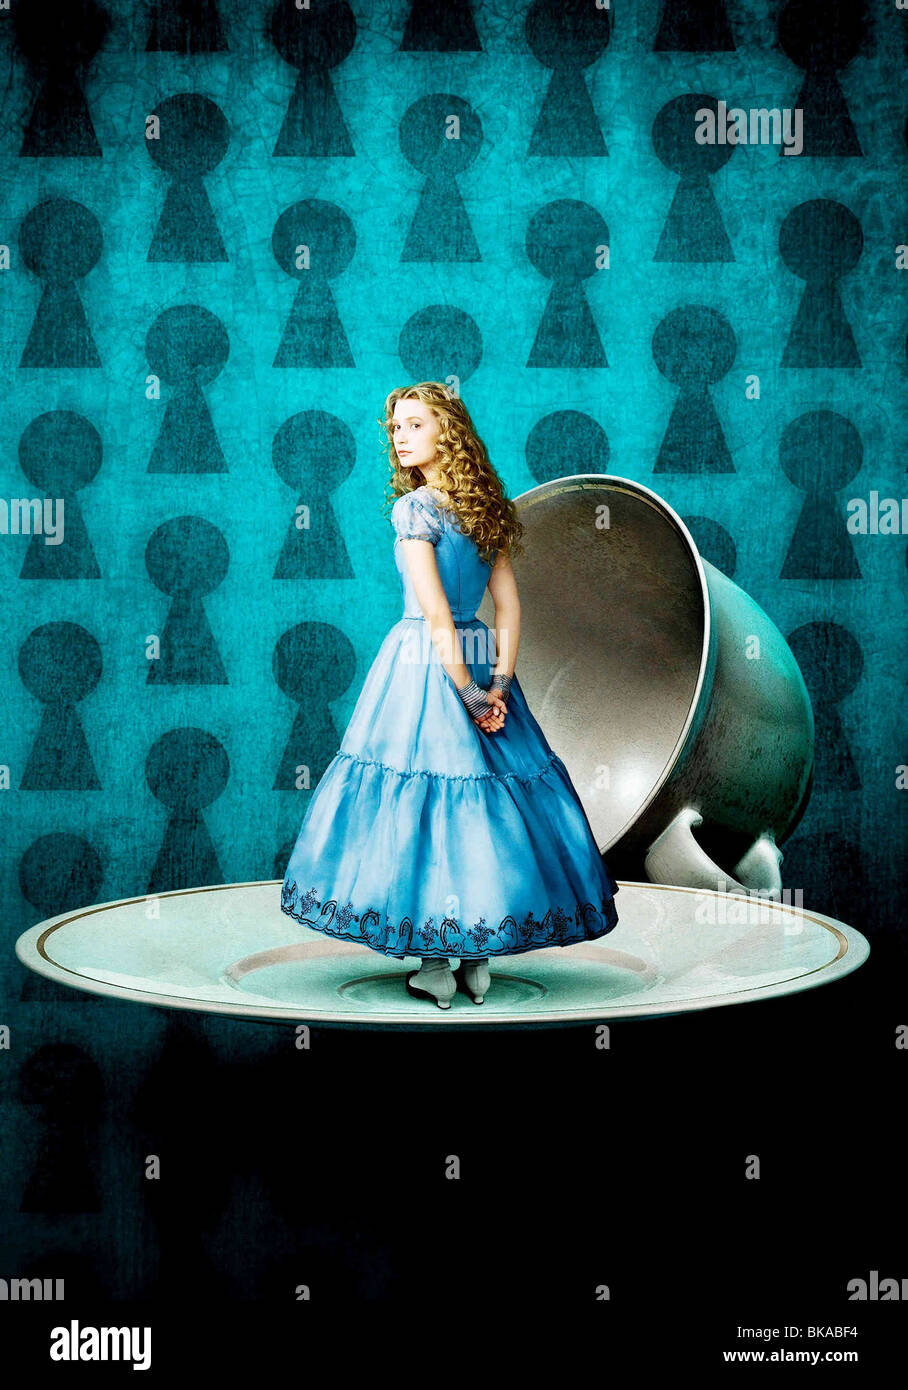 Alice in Wonderland Year: 2010 - USA Director: Tim Burton Mia Wasikowska - Stock Image